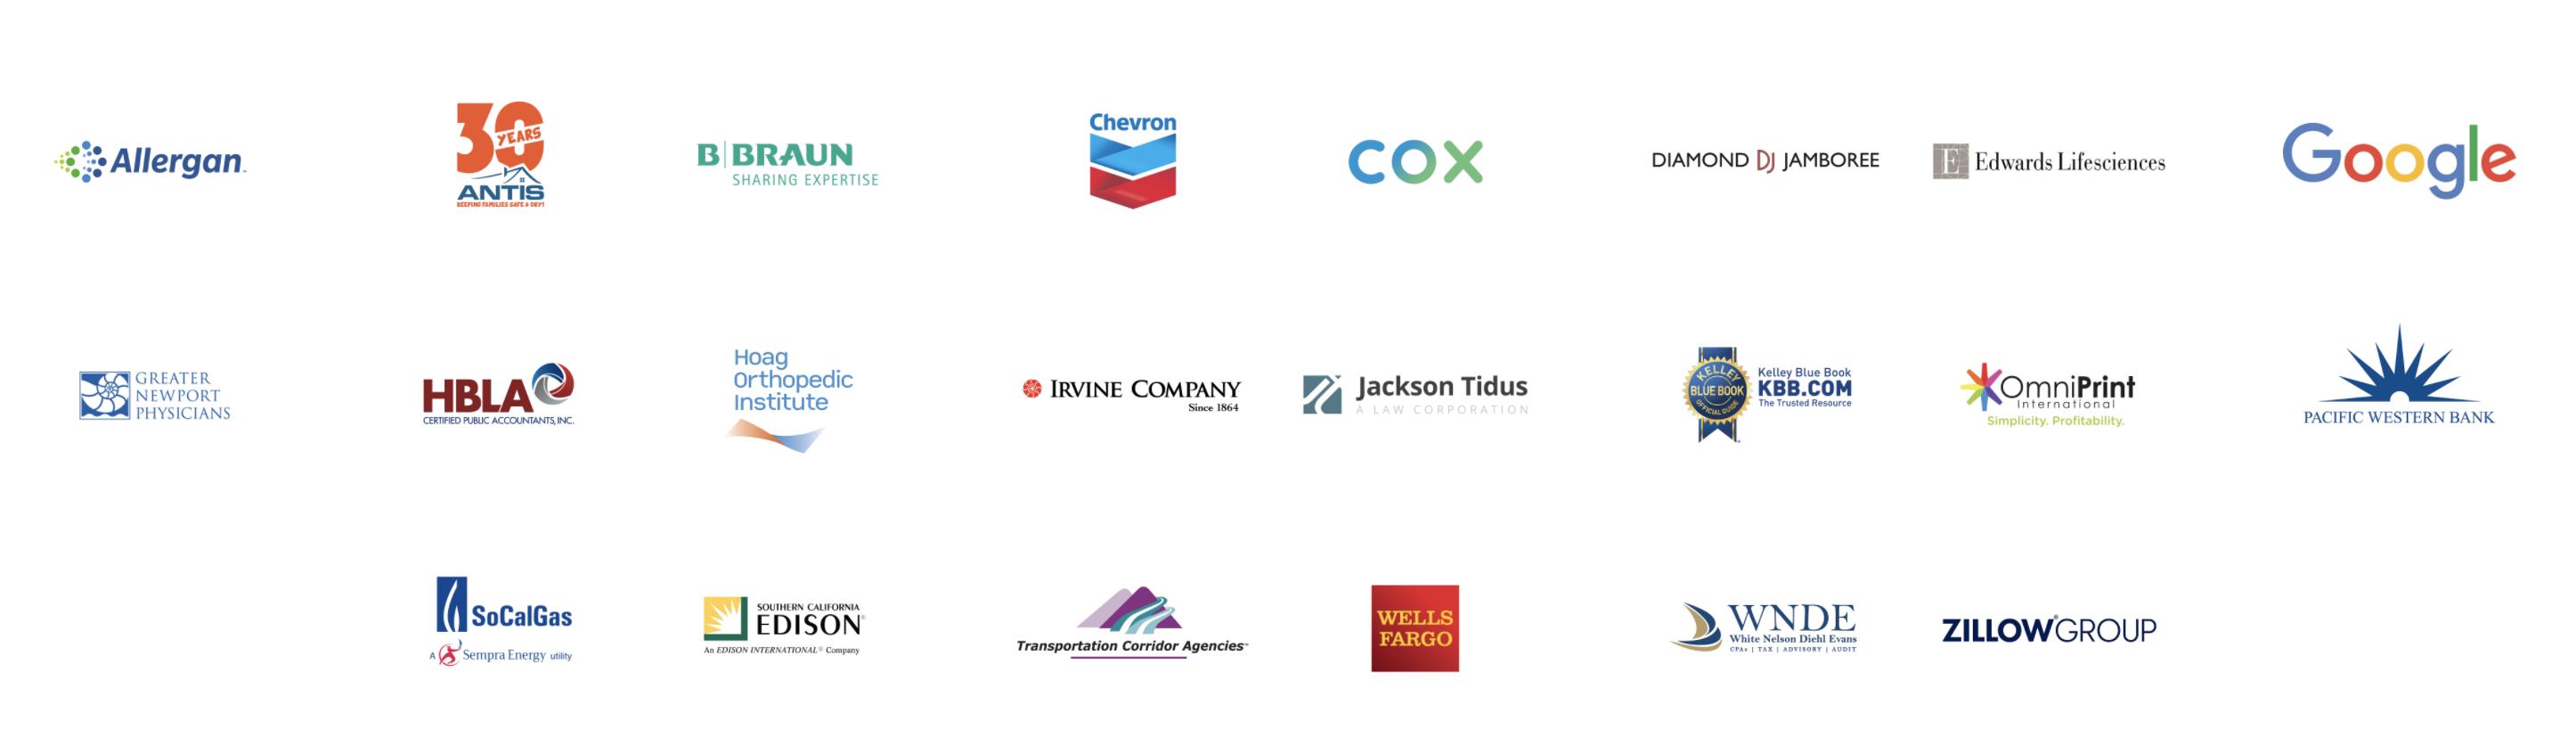 Celebrate Resilience Event Sponsor logos